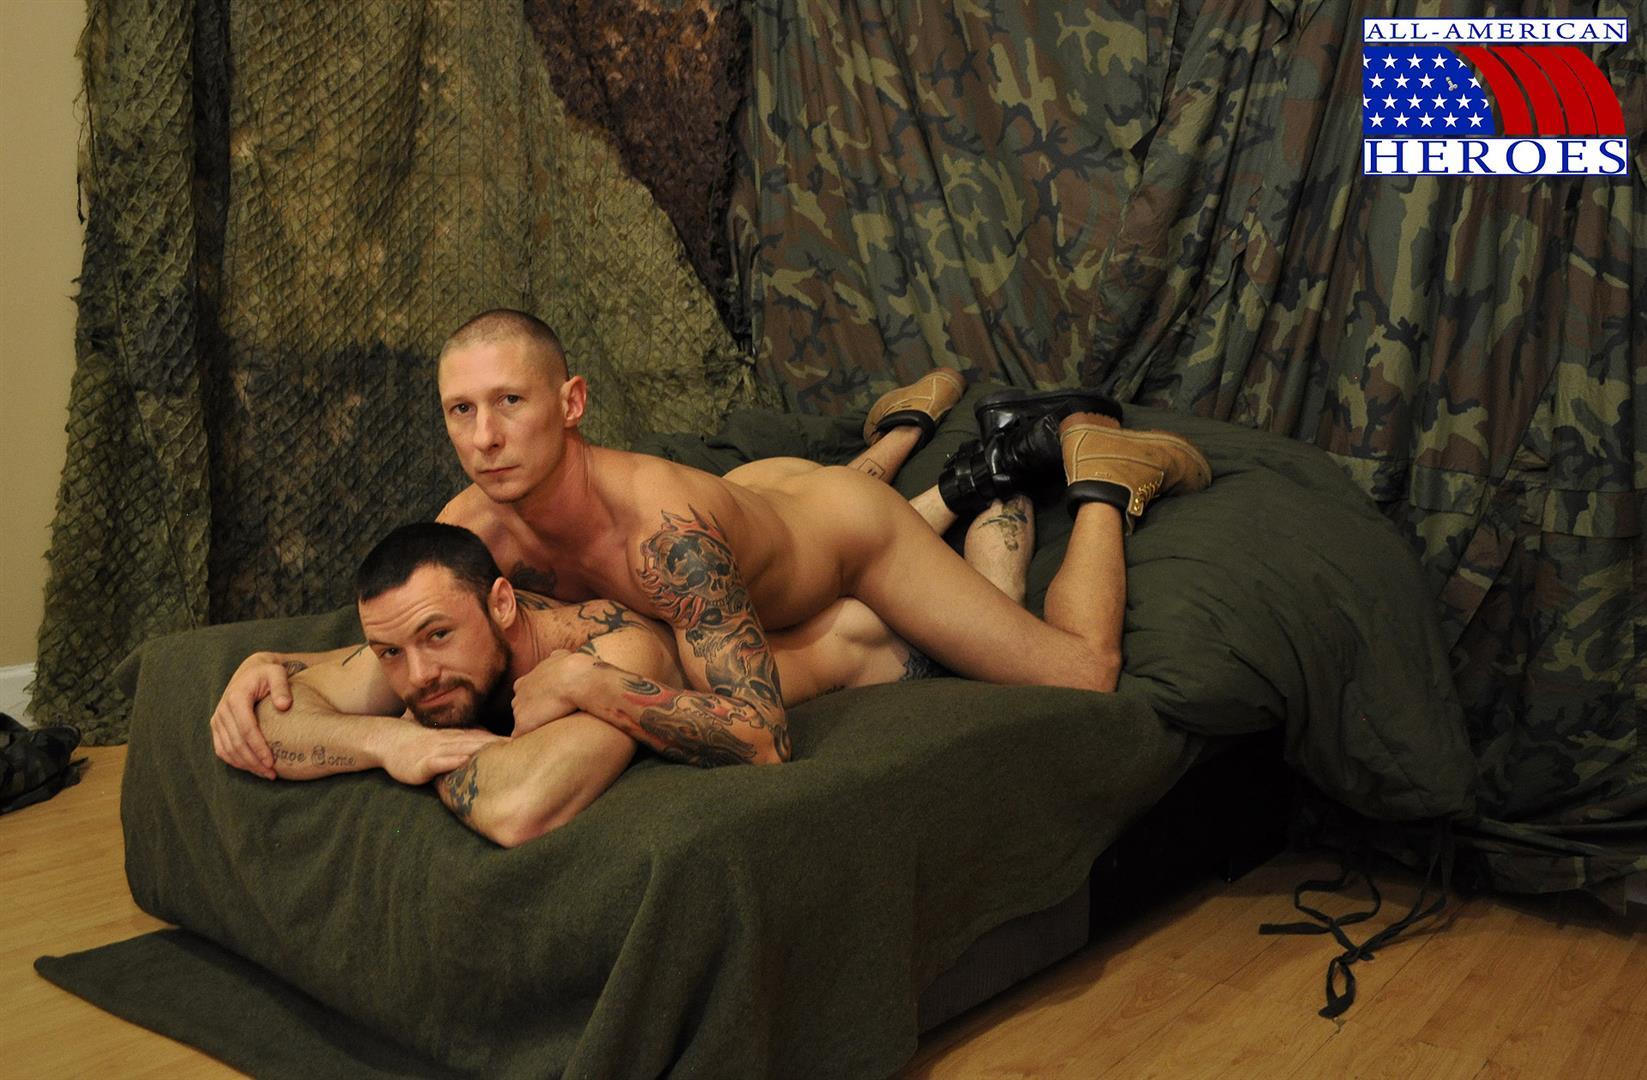 private gay porn Watch Gay Homemade porn videos for free, here on Pornhub.com.